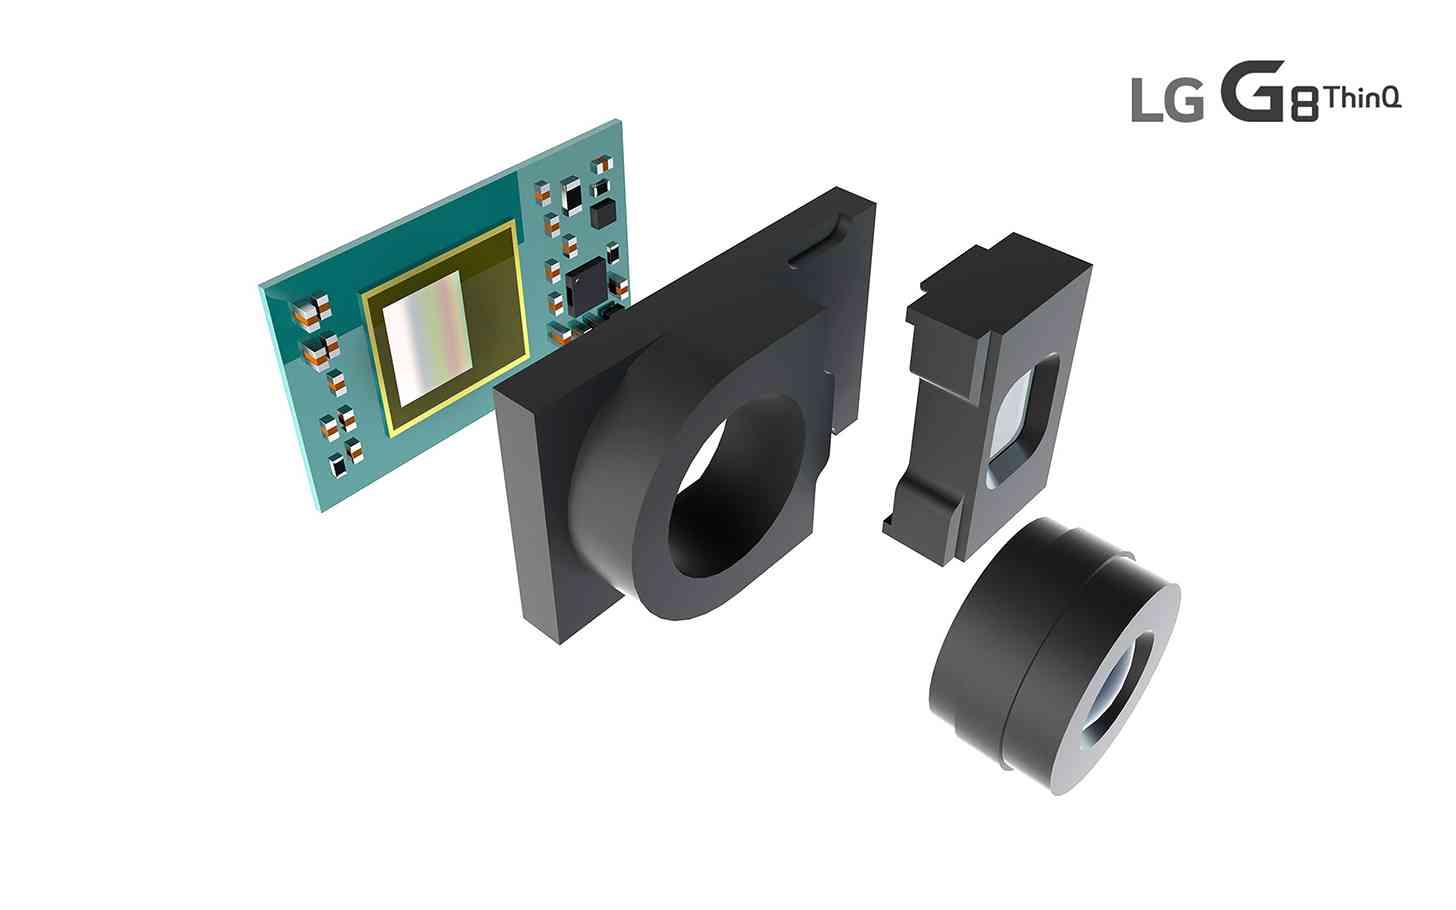 LG G8 ThinQ ToF camera